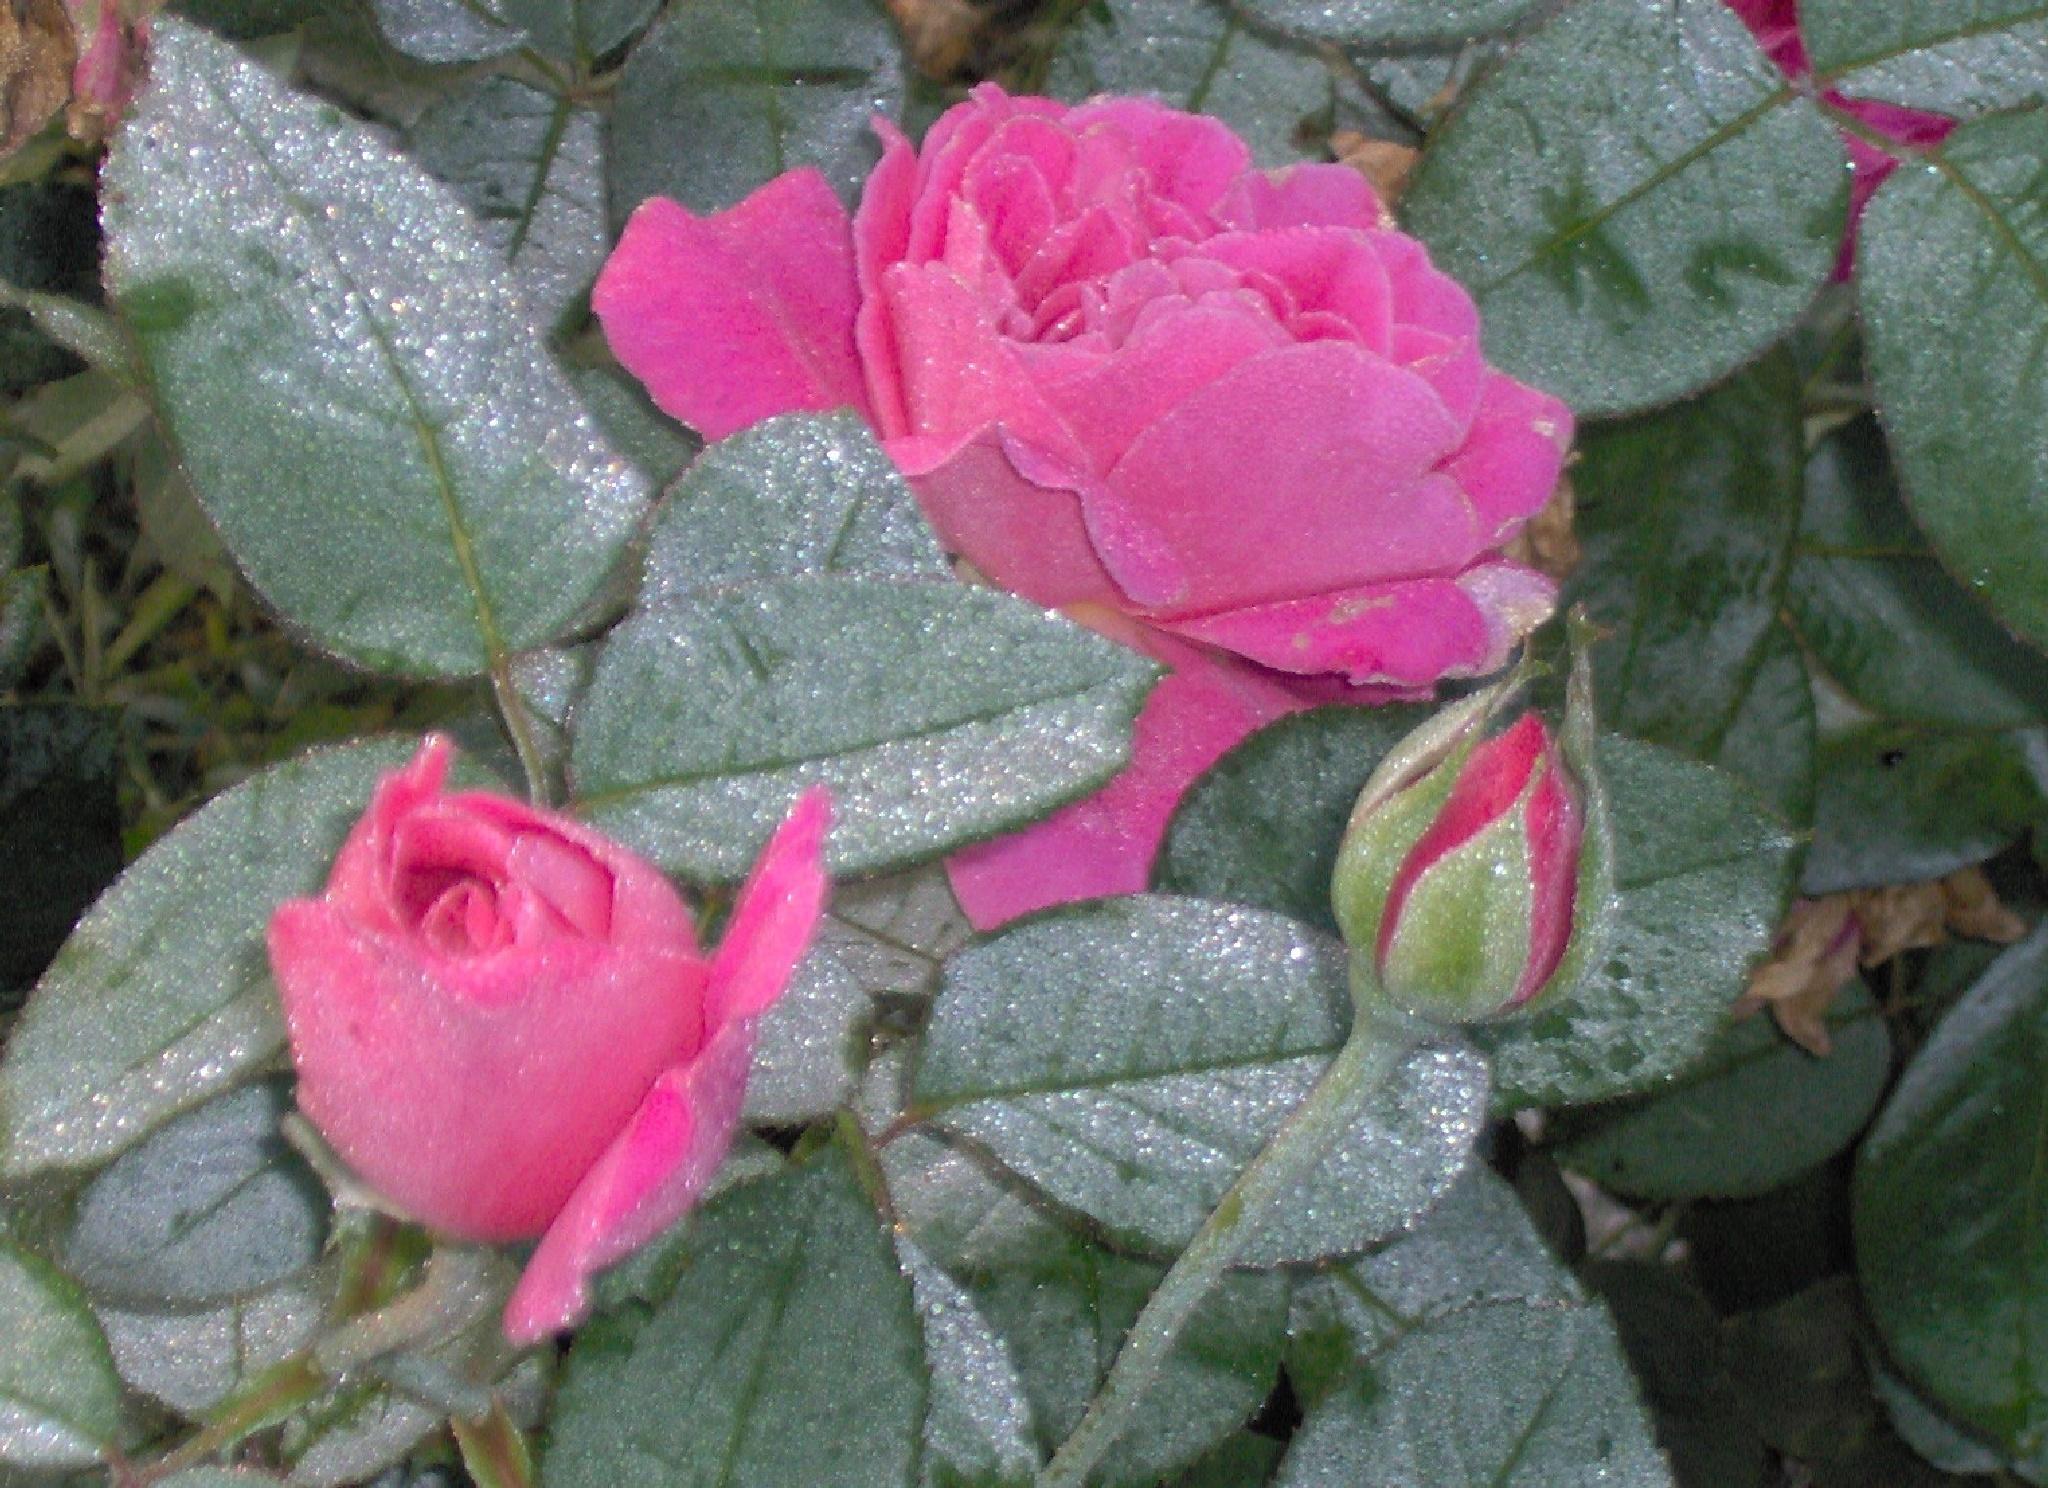 Morning fresh dew on the roses by april.throgmorton